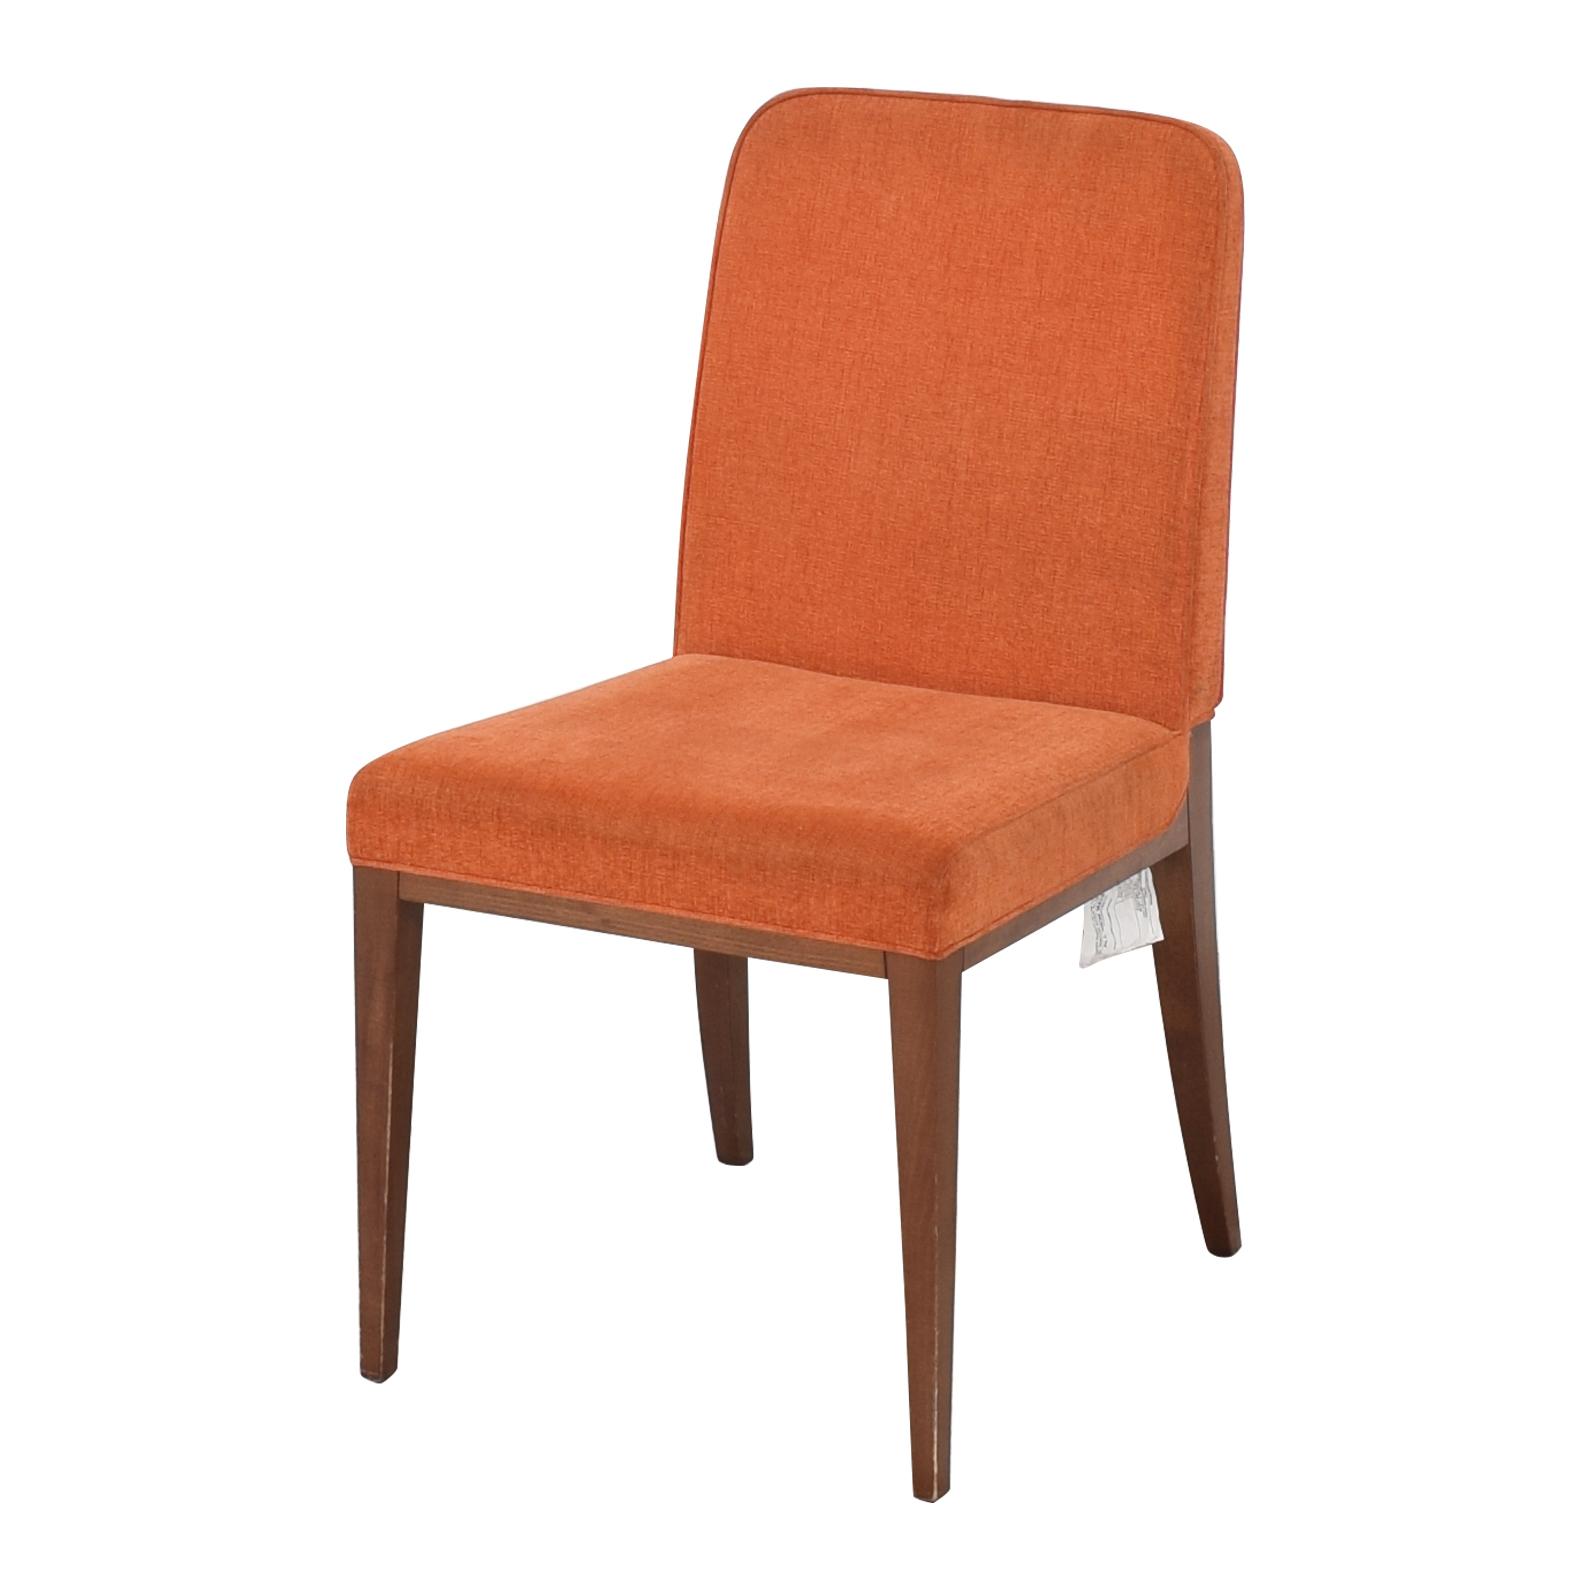 buy Montbel Dining Chairs Montbel Dining Chairs